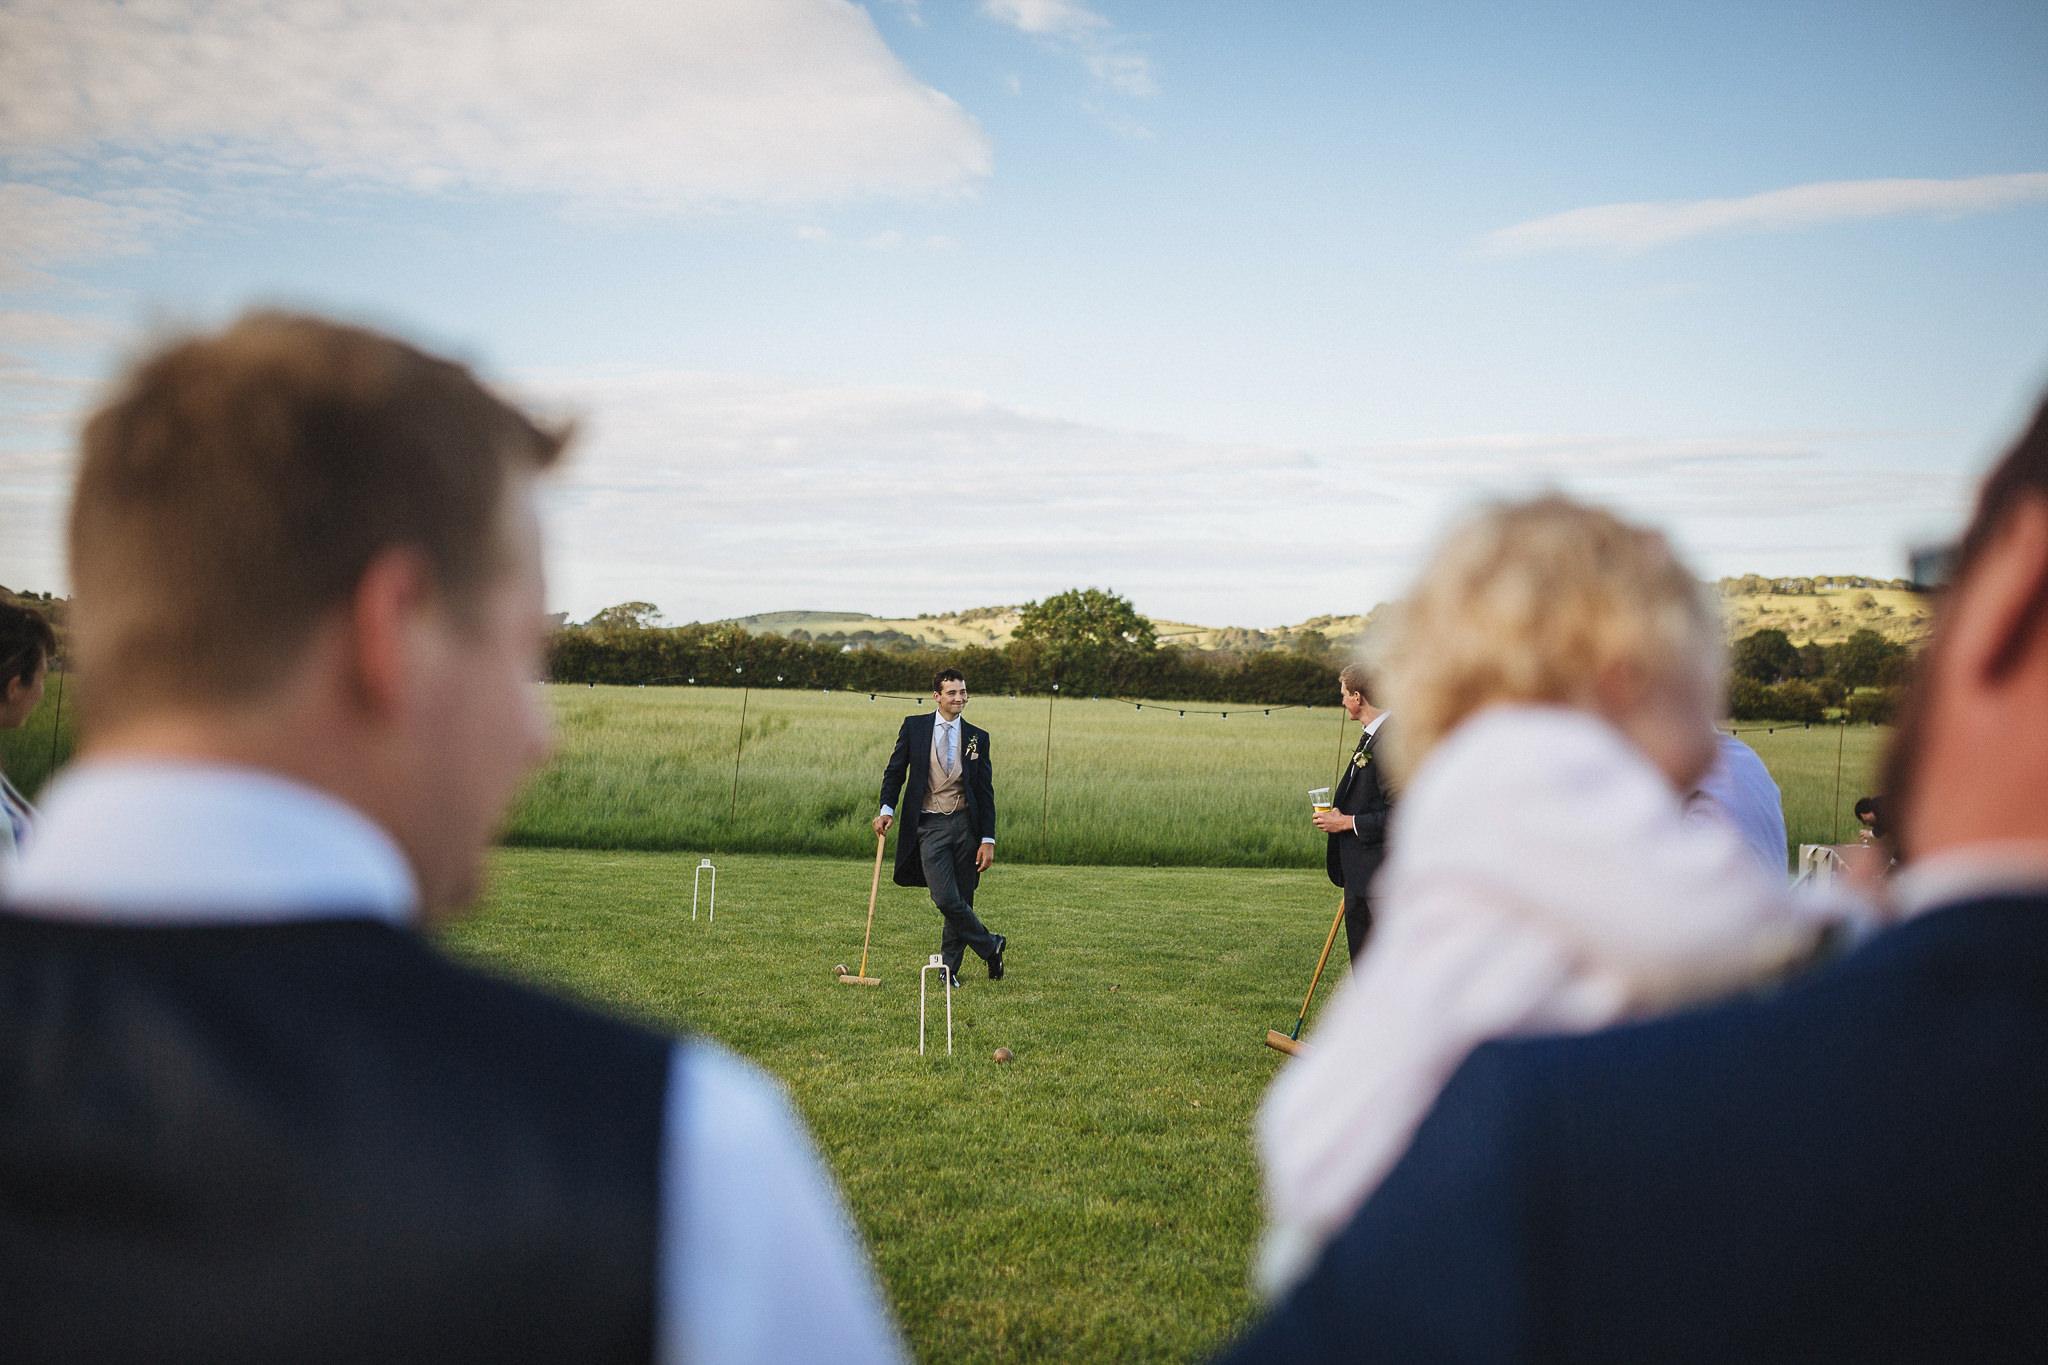 paul-marbrook-Farm-Wedding-Photographer-Lancashire-90077